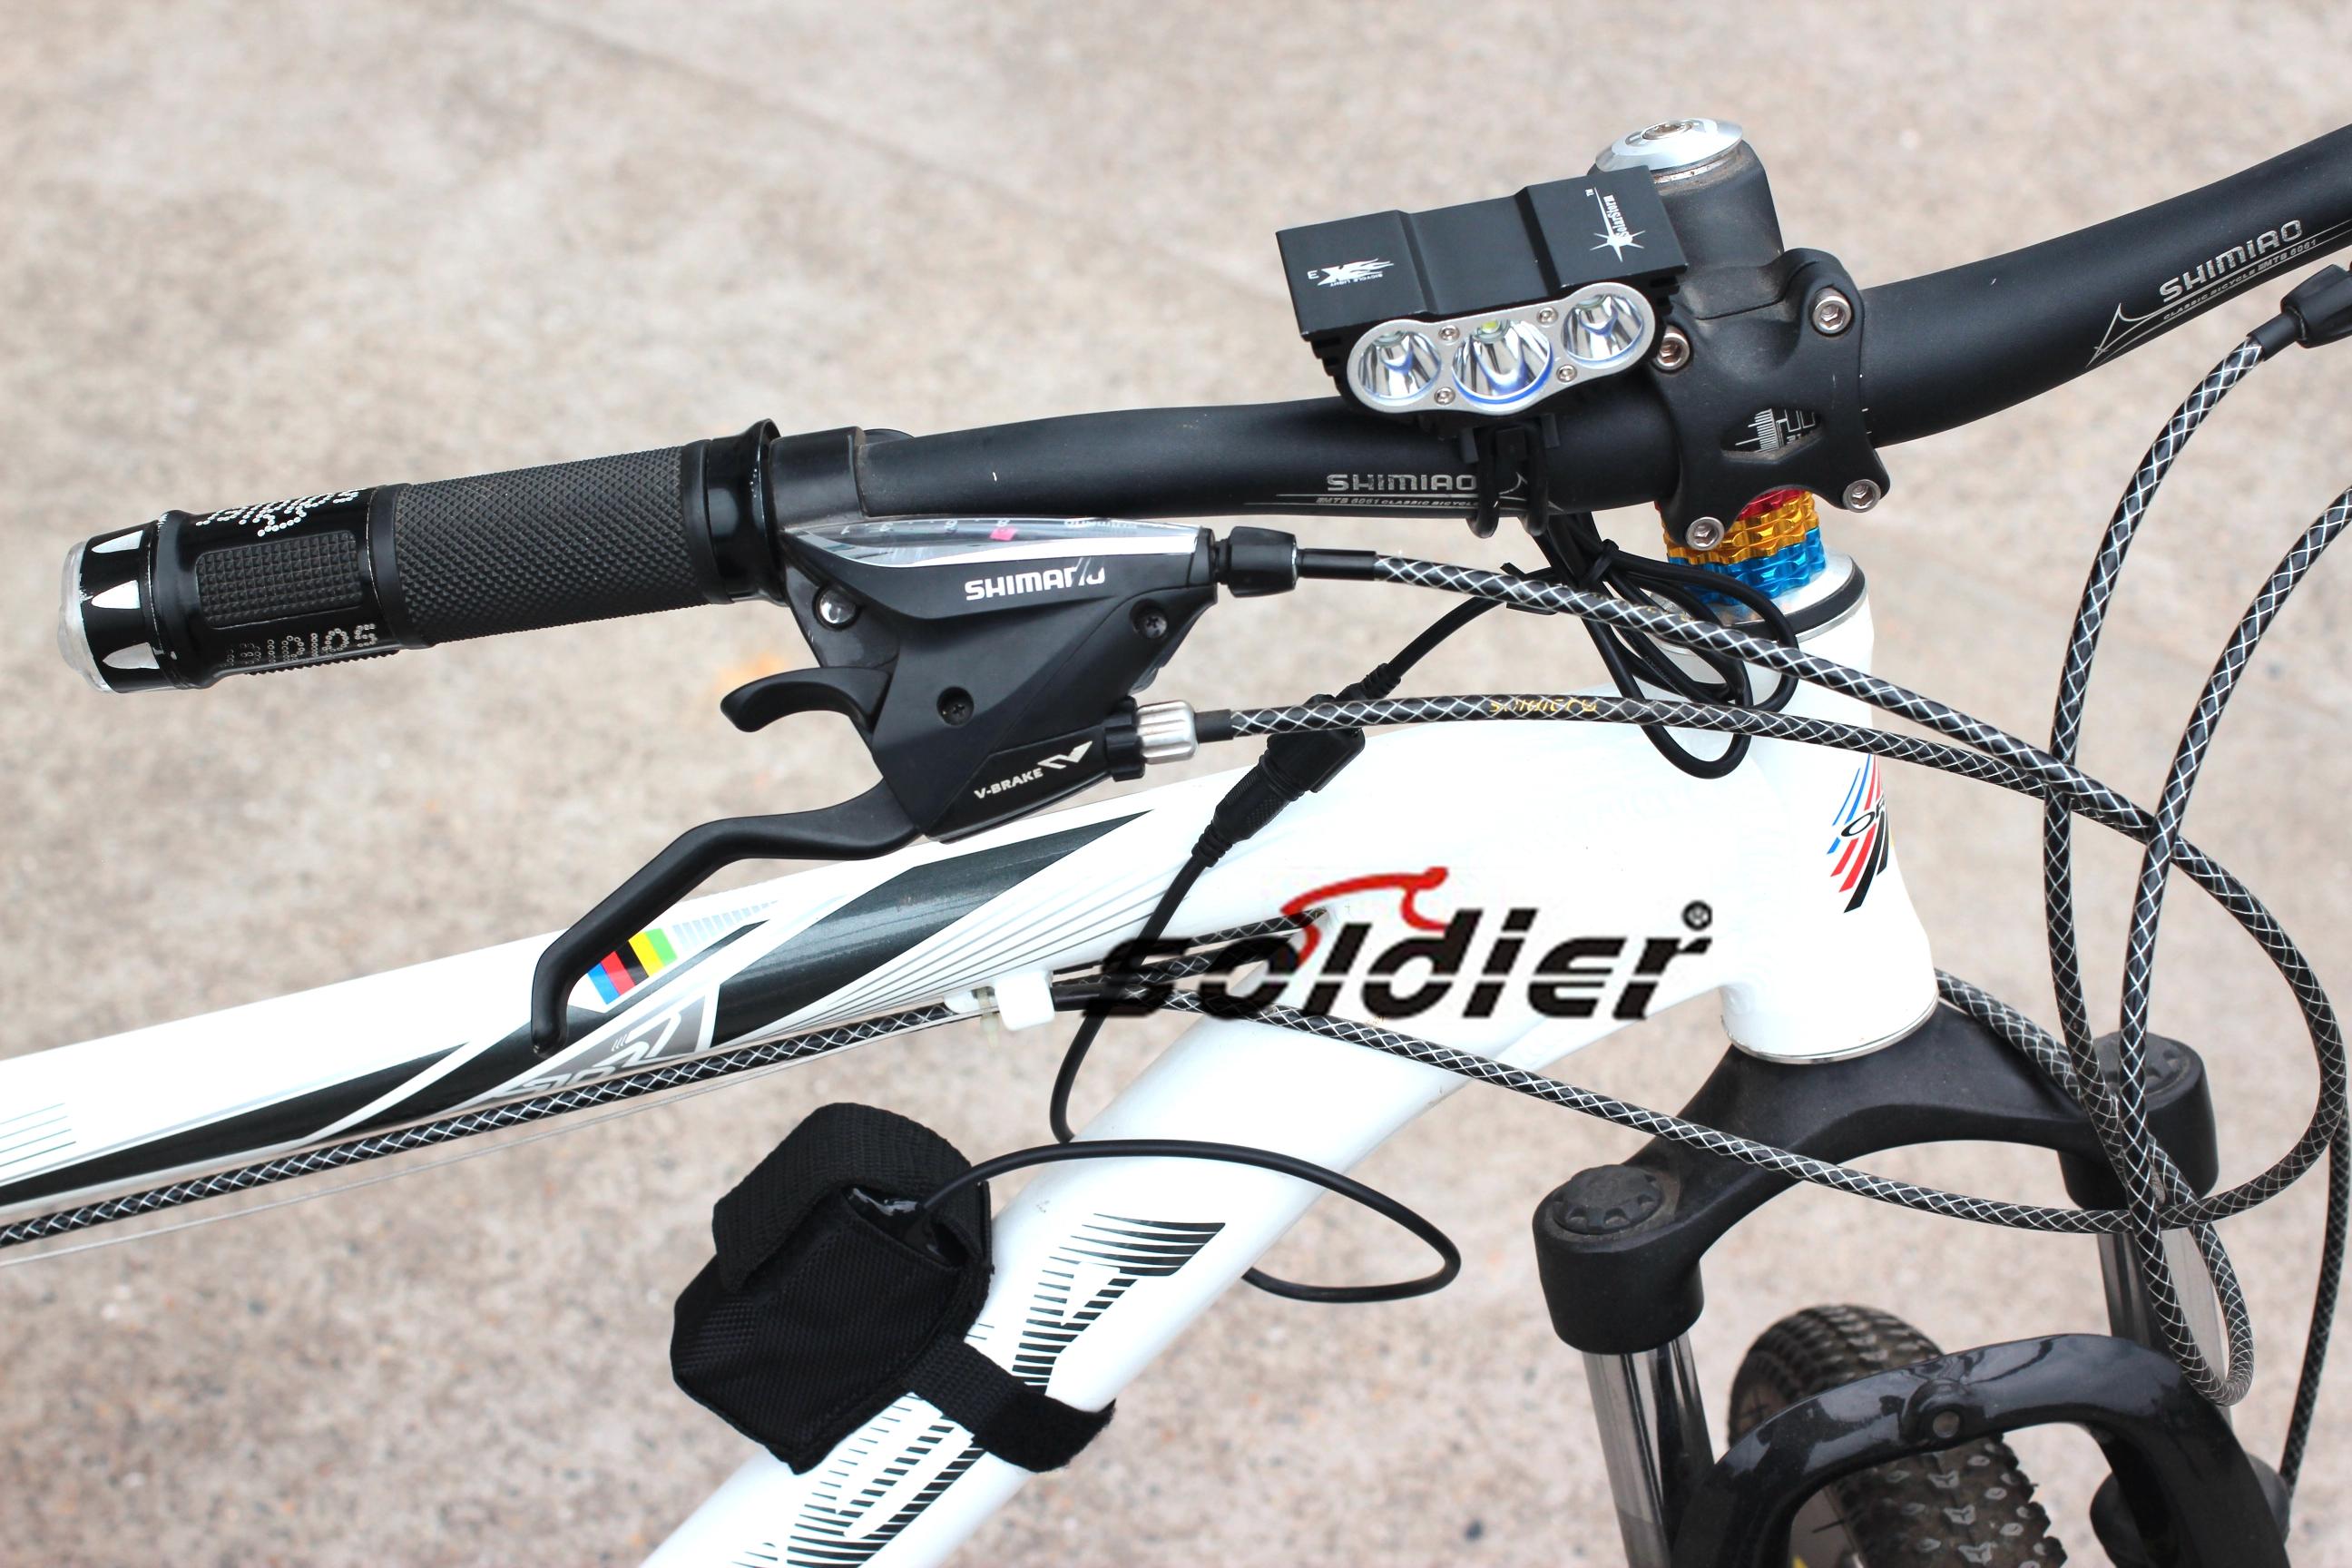 3T6自行车灯3U2 L2四档x3猫头鹰单车前灯套装